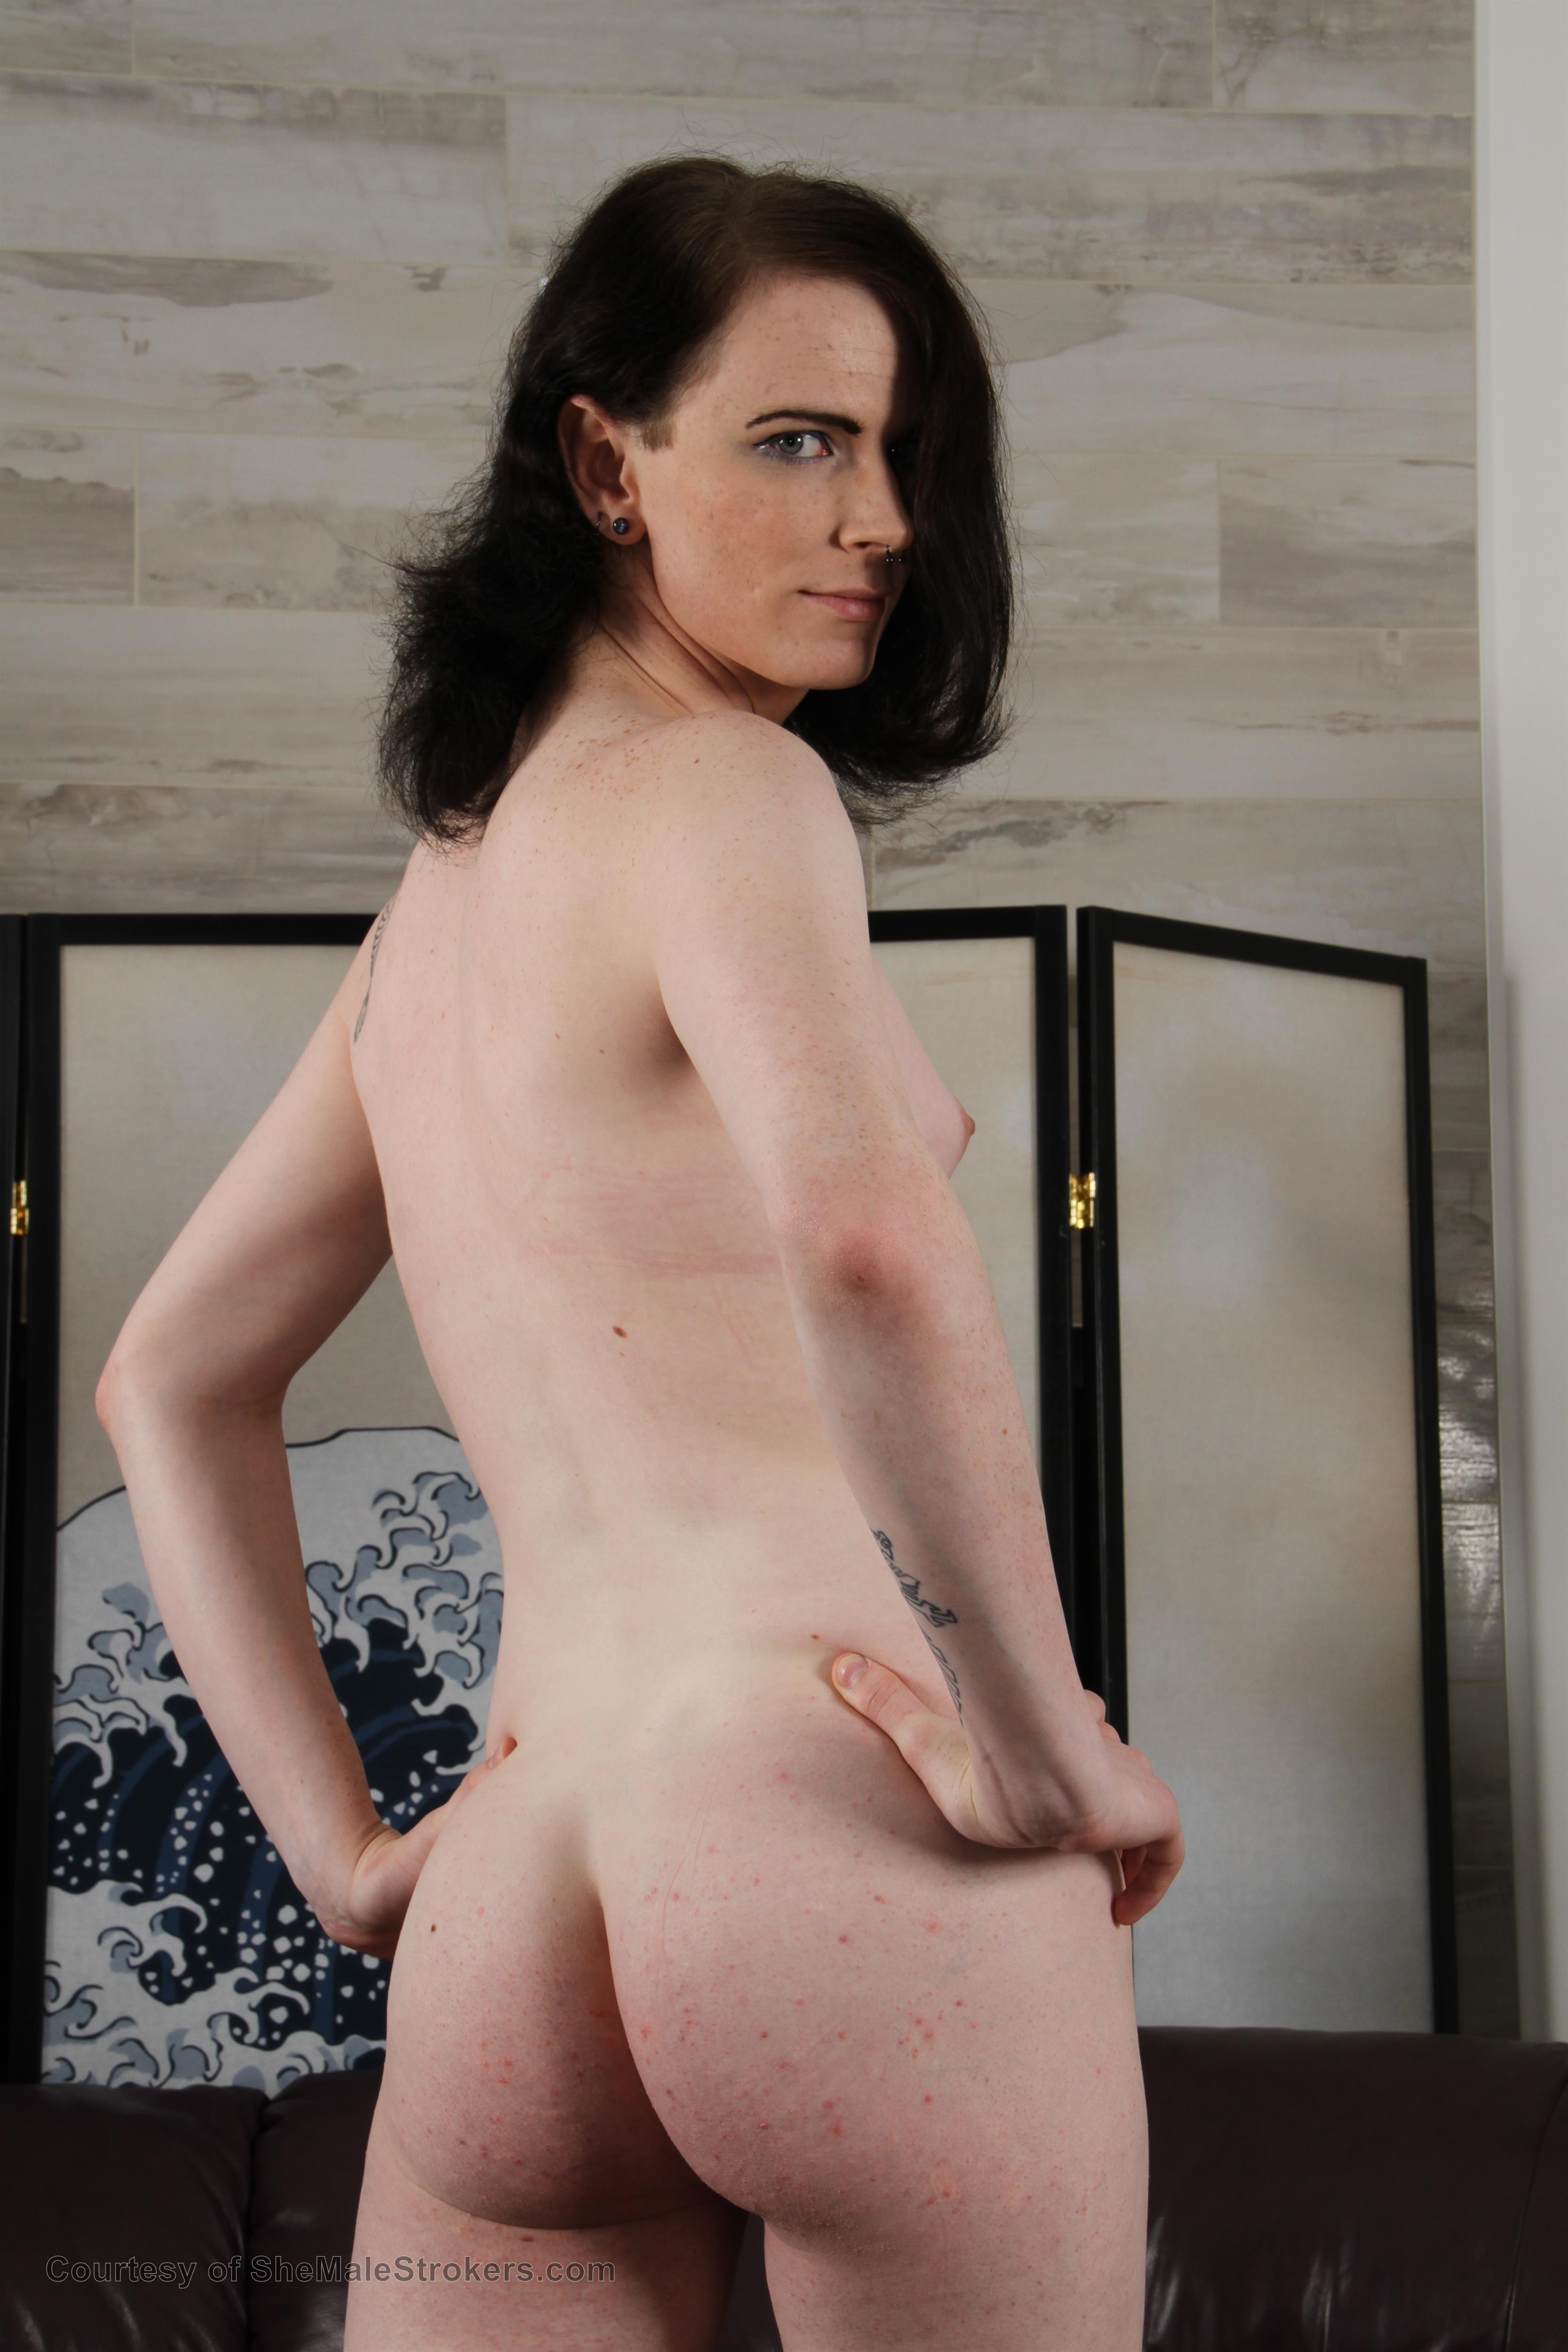 hot girls nude games